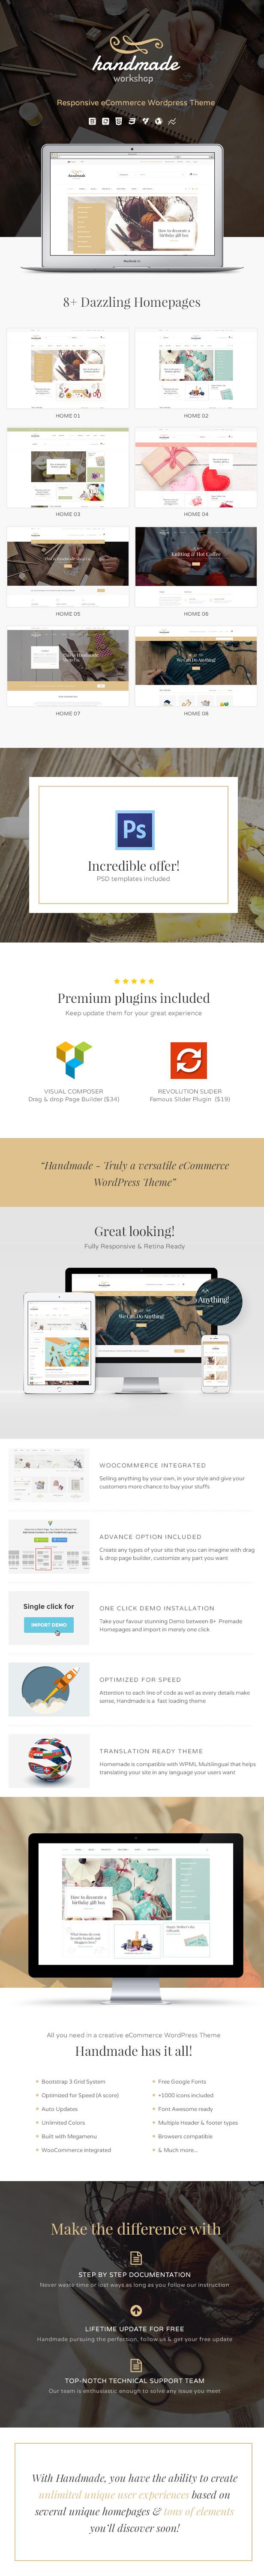 handmade description - Handmade - Shop WordPress WooCommerce Theme